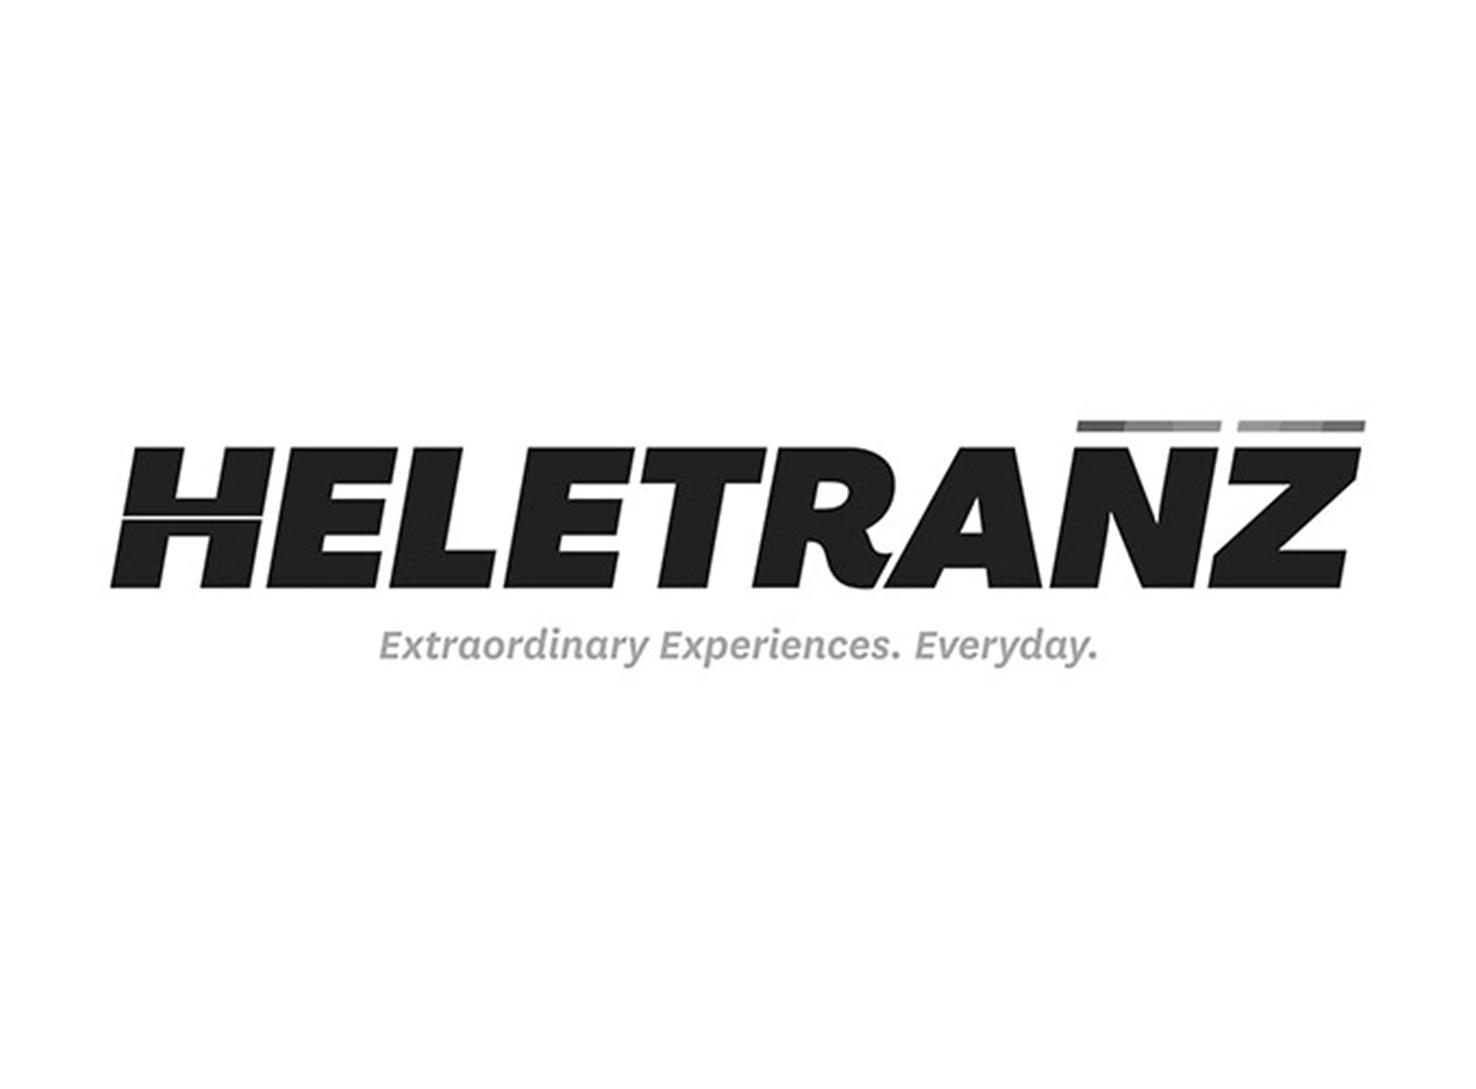 Heletranz.png